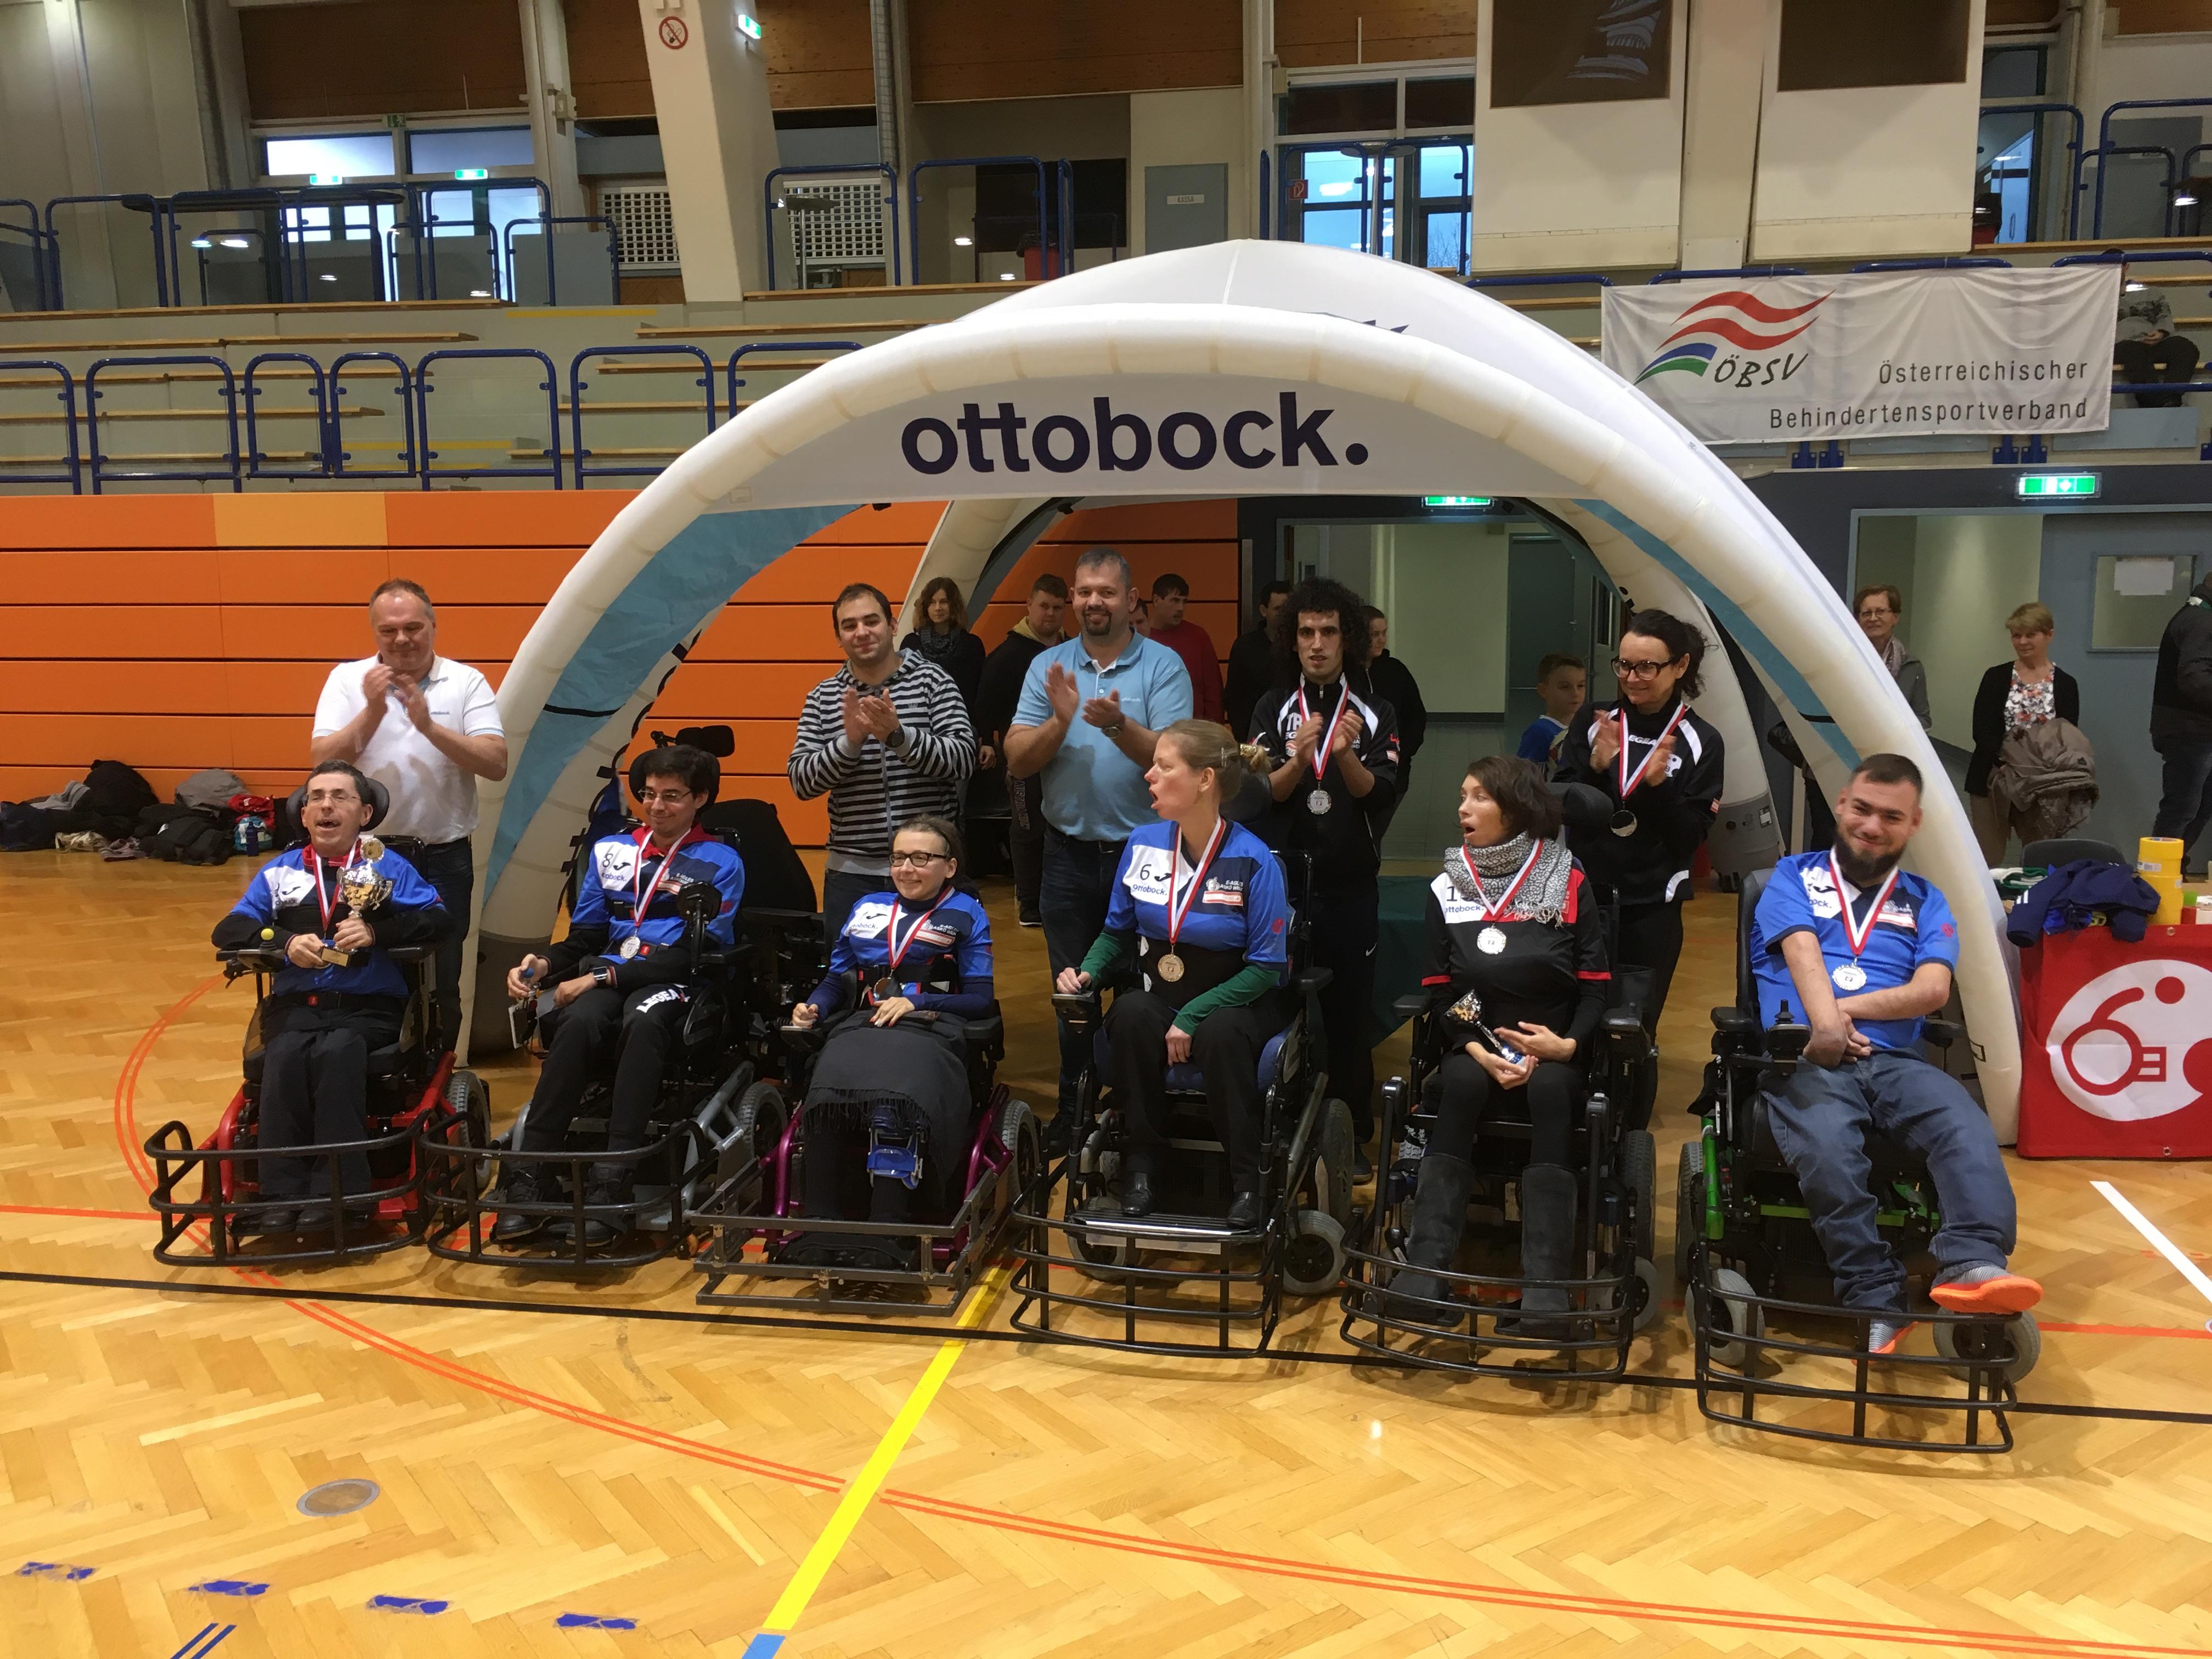 Thunder E-agles des ASKÖ Wien gewinnen ottobock.CUP 2017